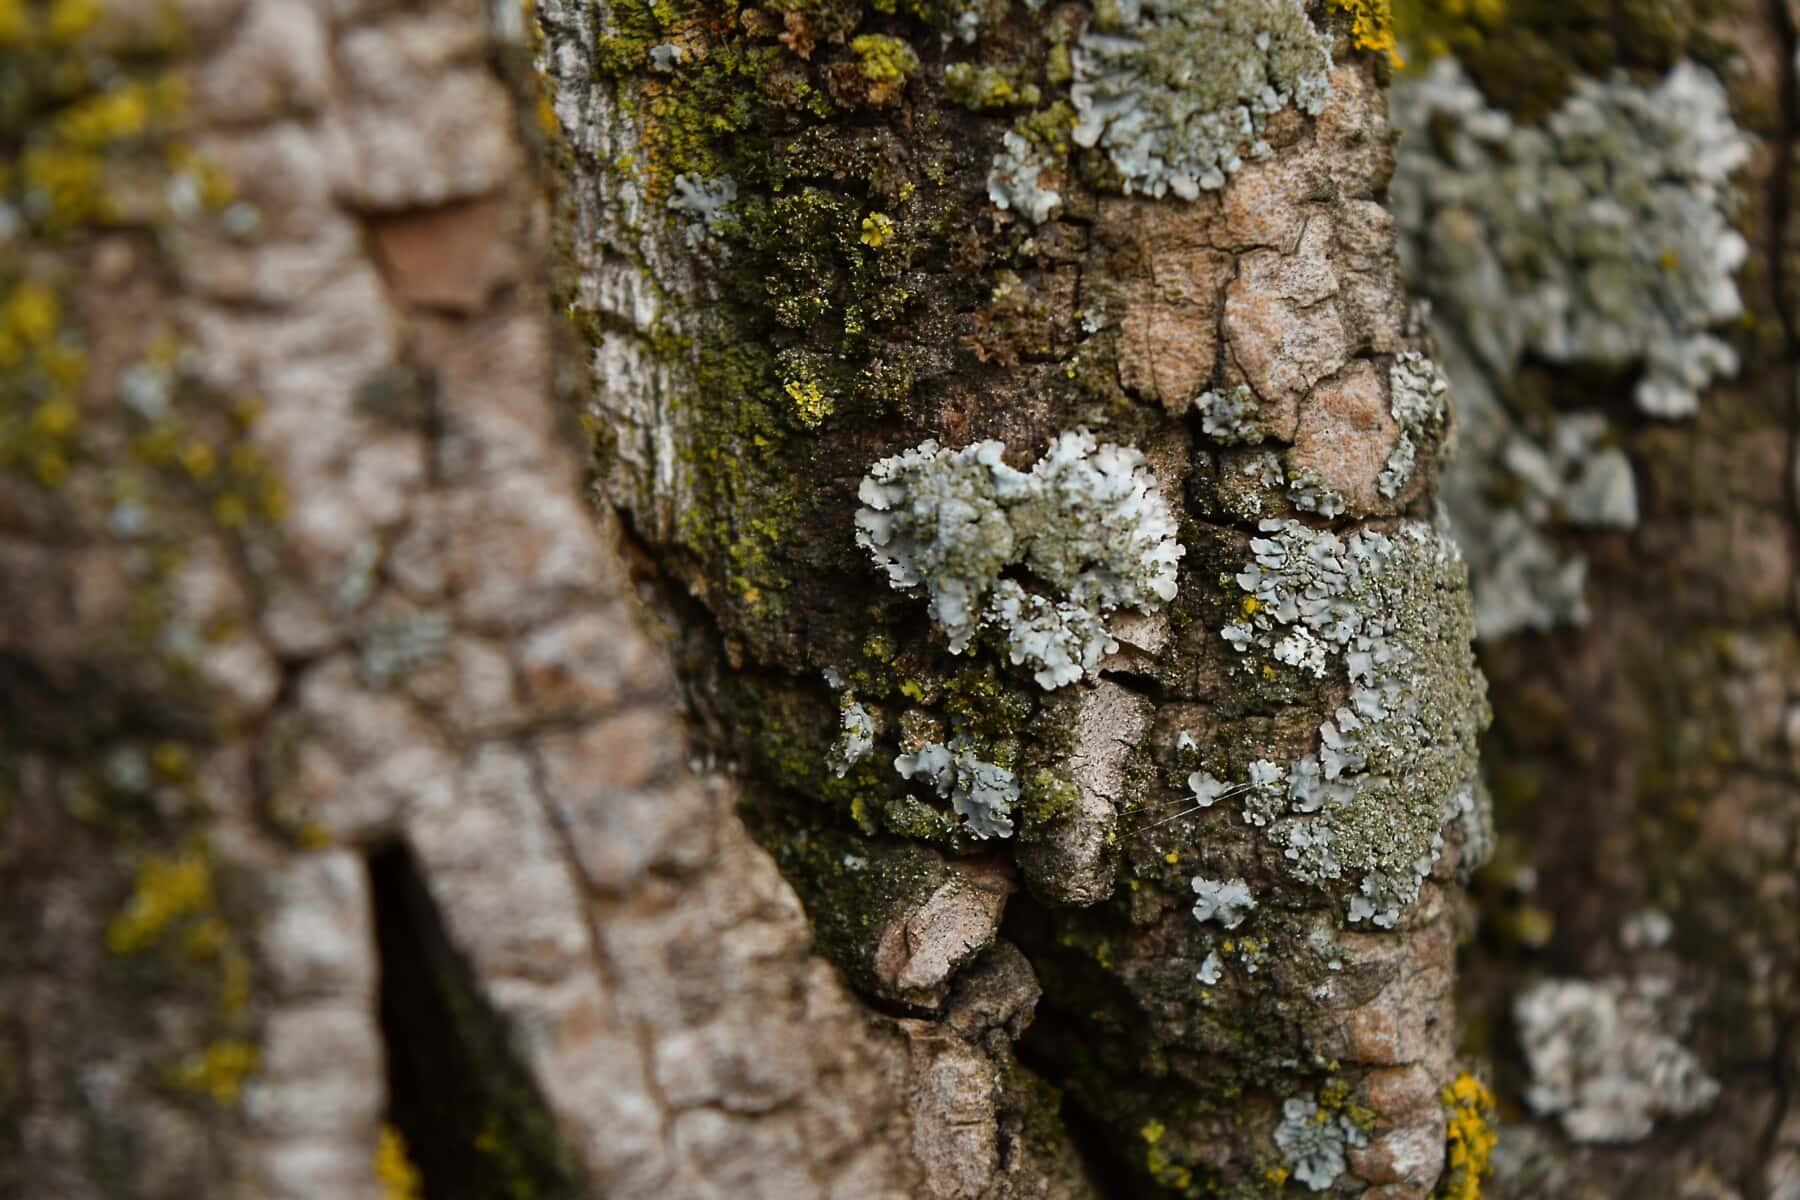 lichen, trees, moss, bark, texture, tree, fungus, nature, wood, rough